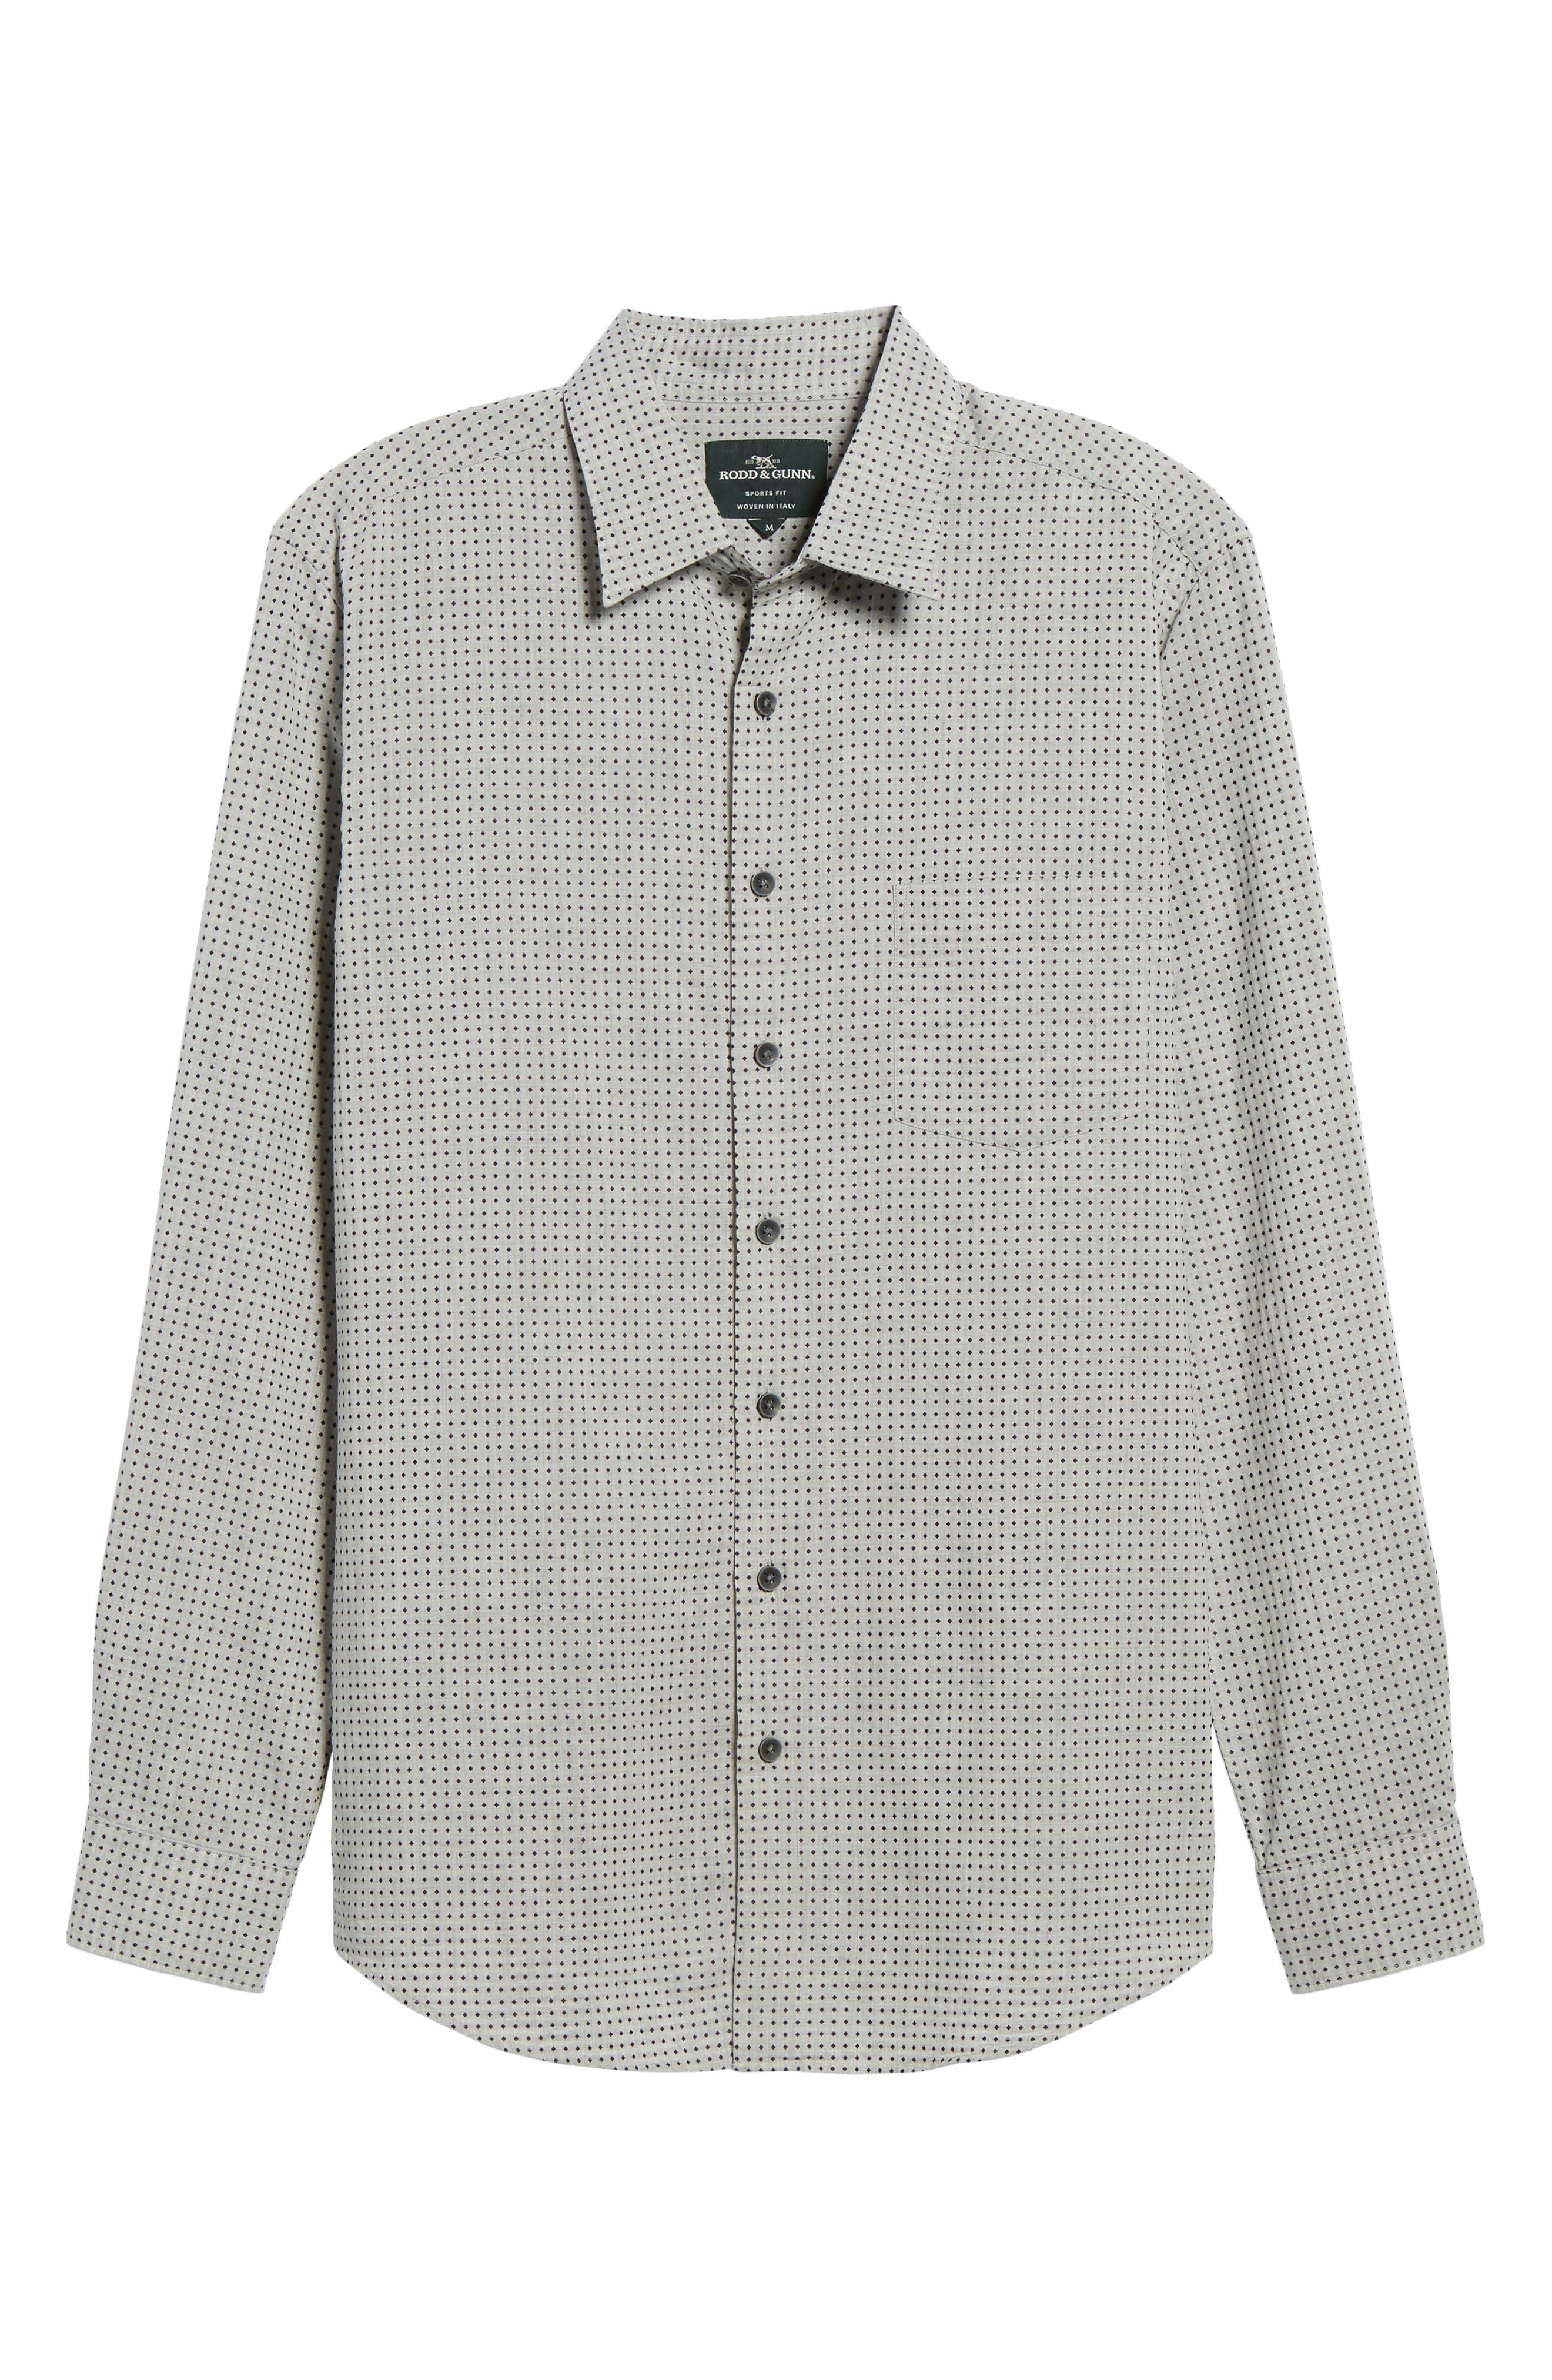 Judgeford Slim Fit Jacquard Sport Shirt,                             Alternate thumbnail 6, color,